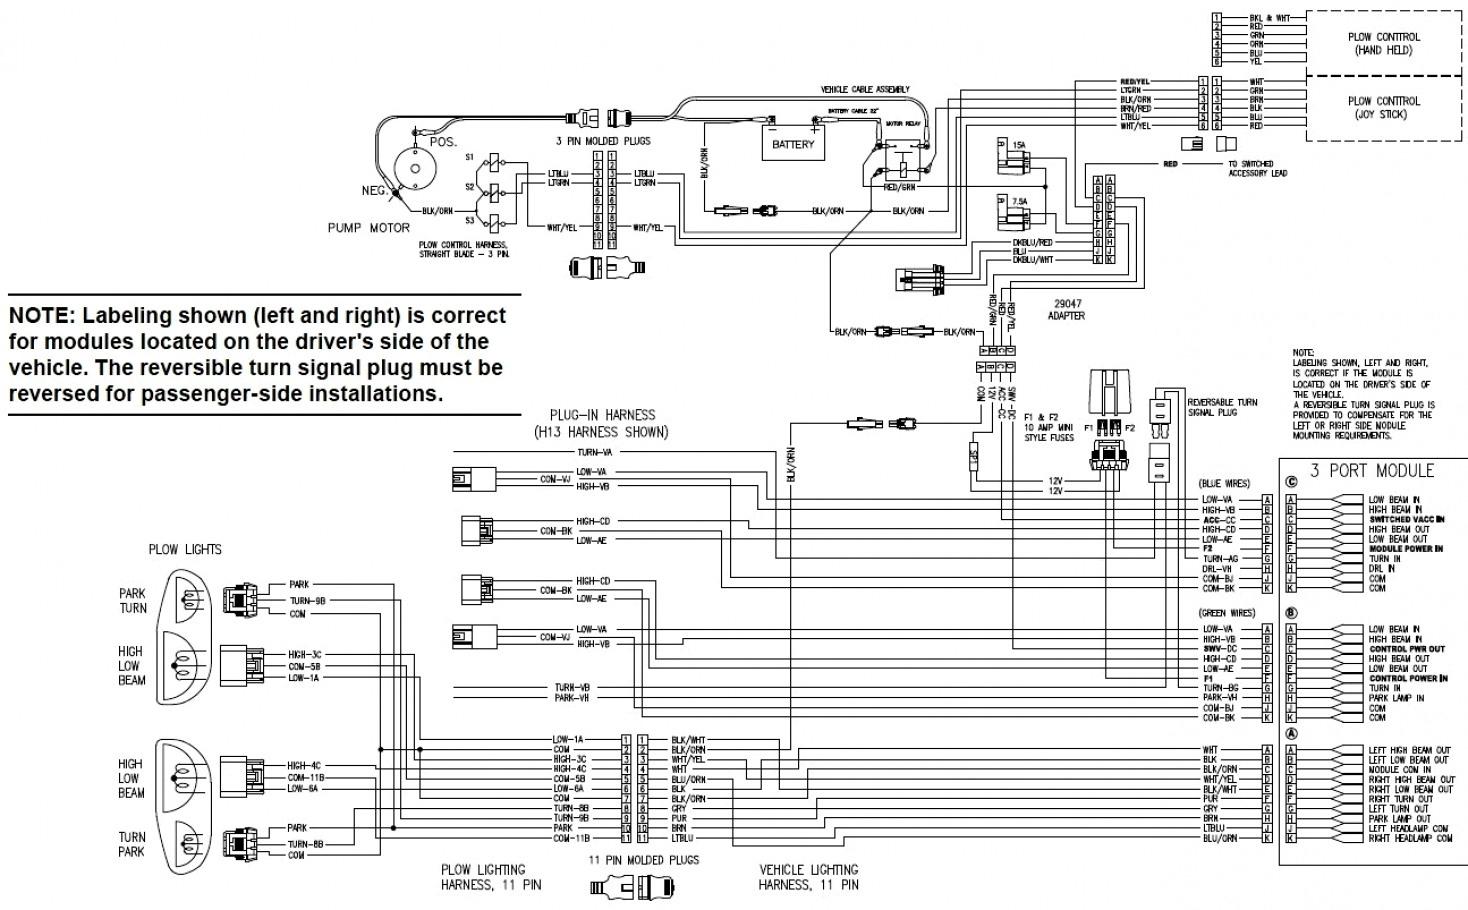 Seven Pin Wiring Diagram Western Plow   Wiring Diagram - Western Plow Solenoid Wiring Diagram